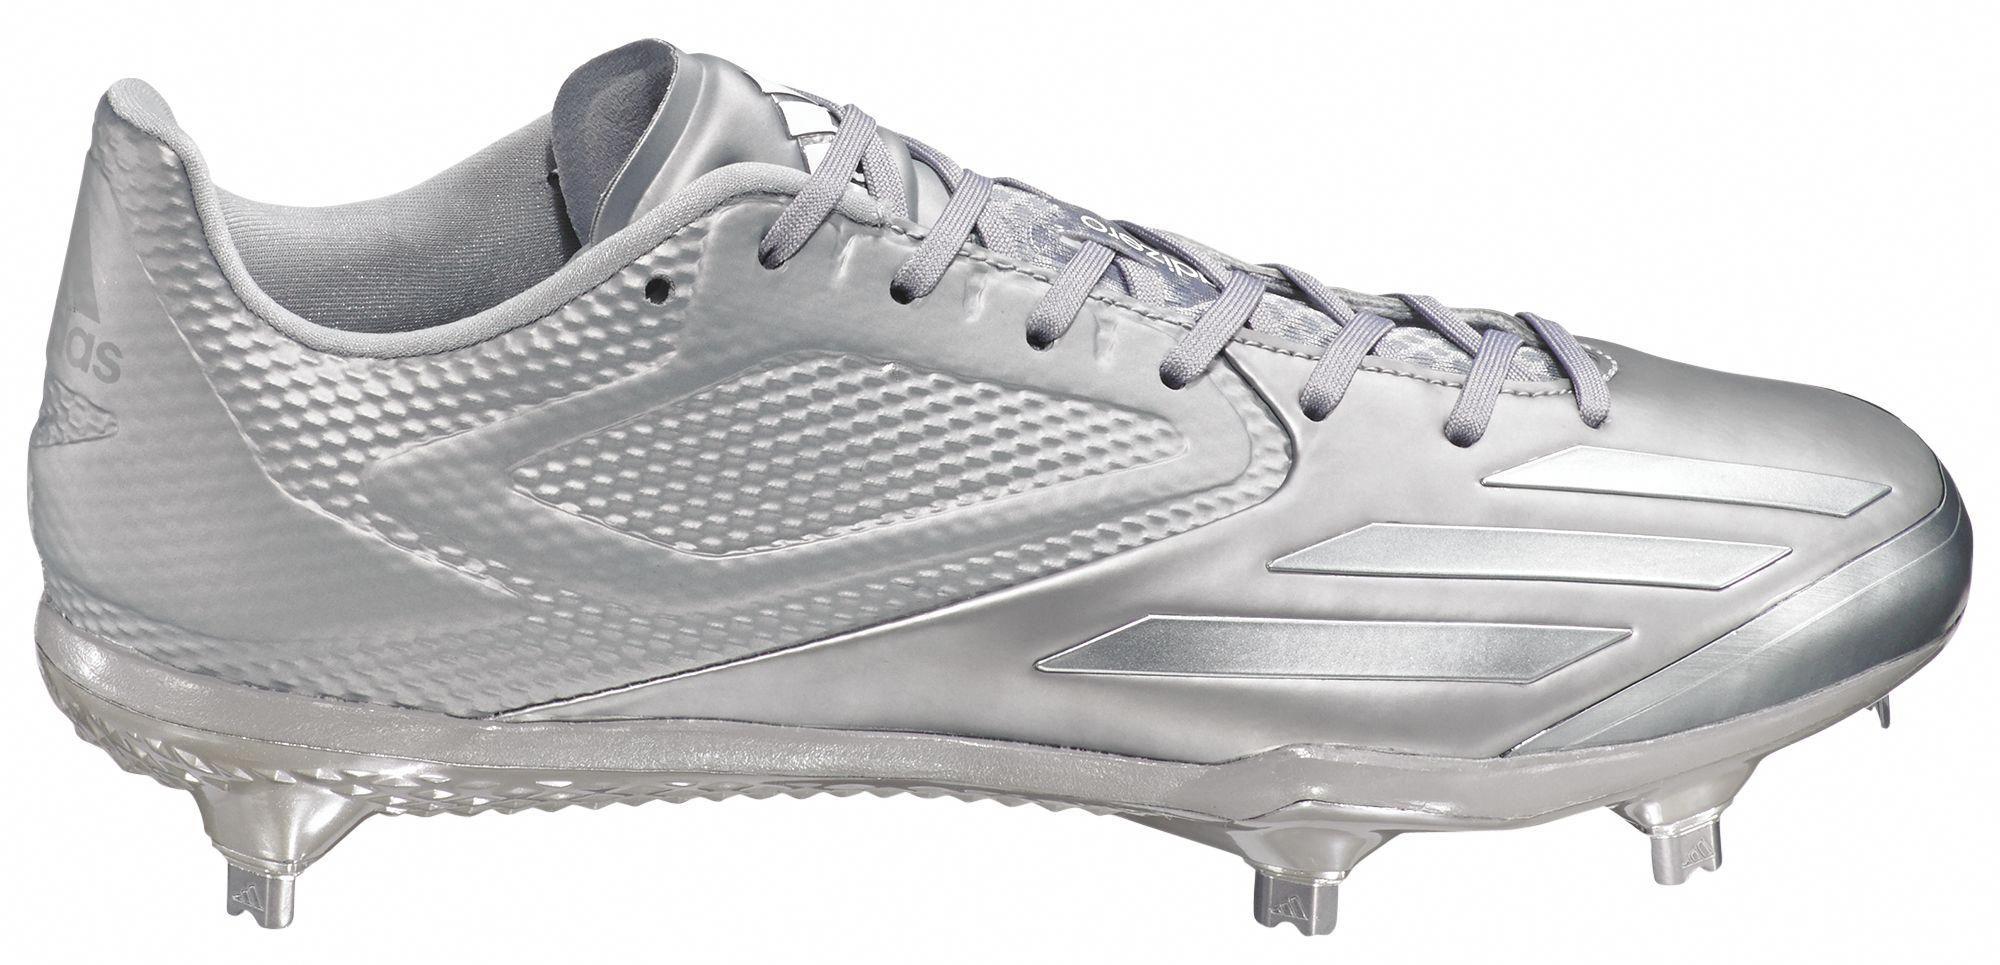 adidas Men s adizero Afterburner 3 E Metal Baseball Cleats 18c0a3bfd22